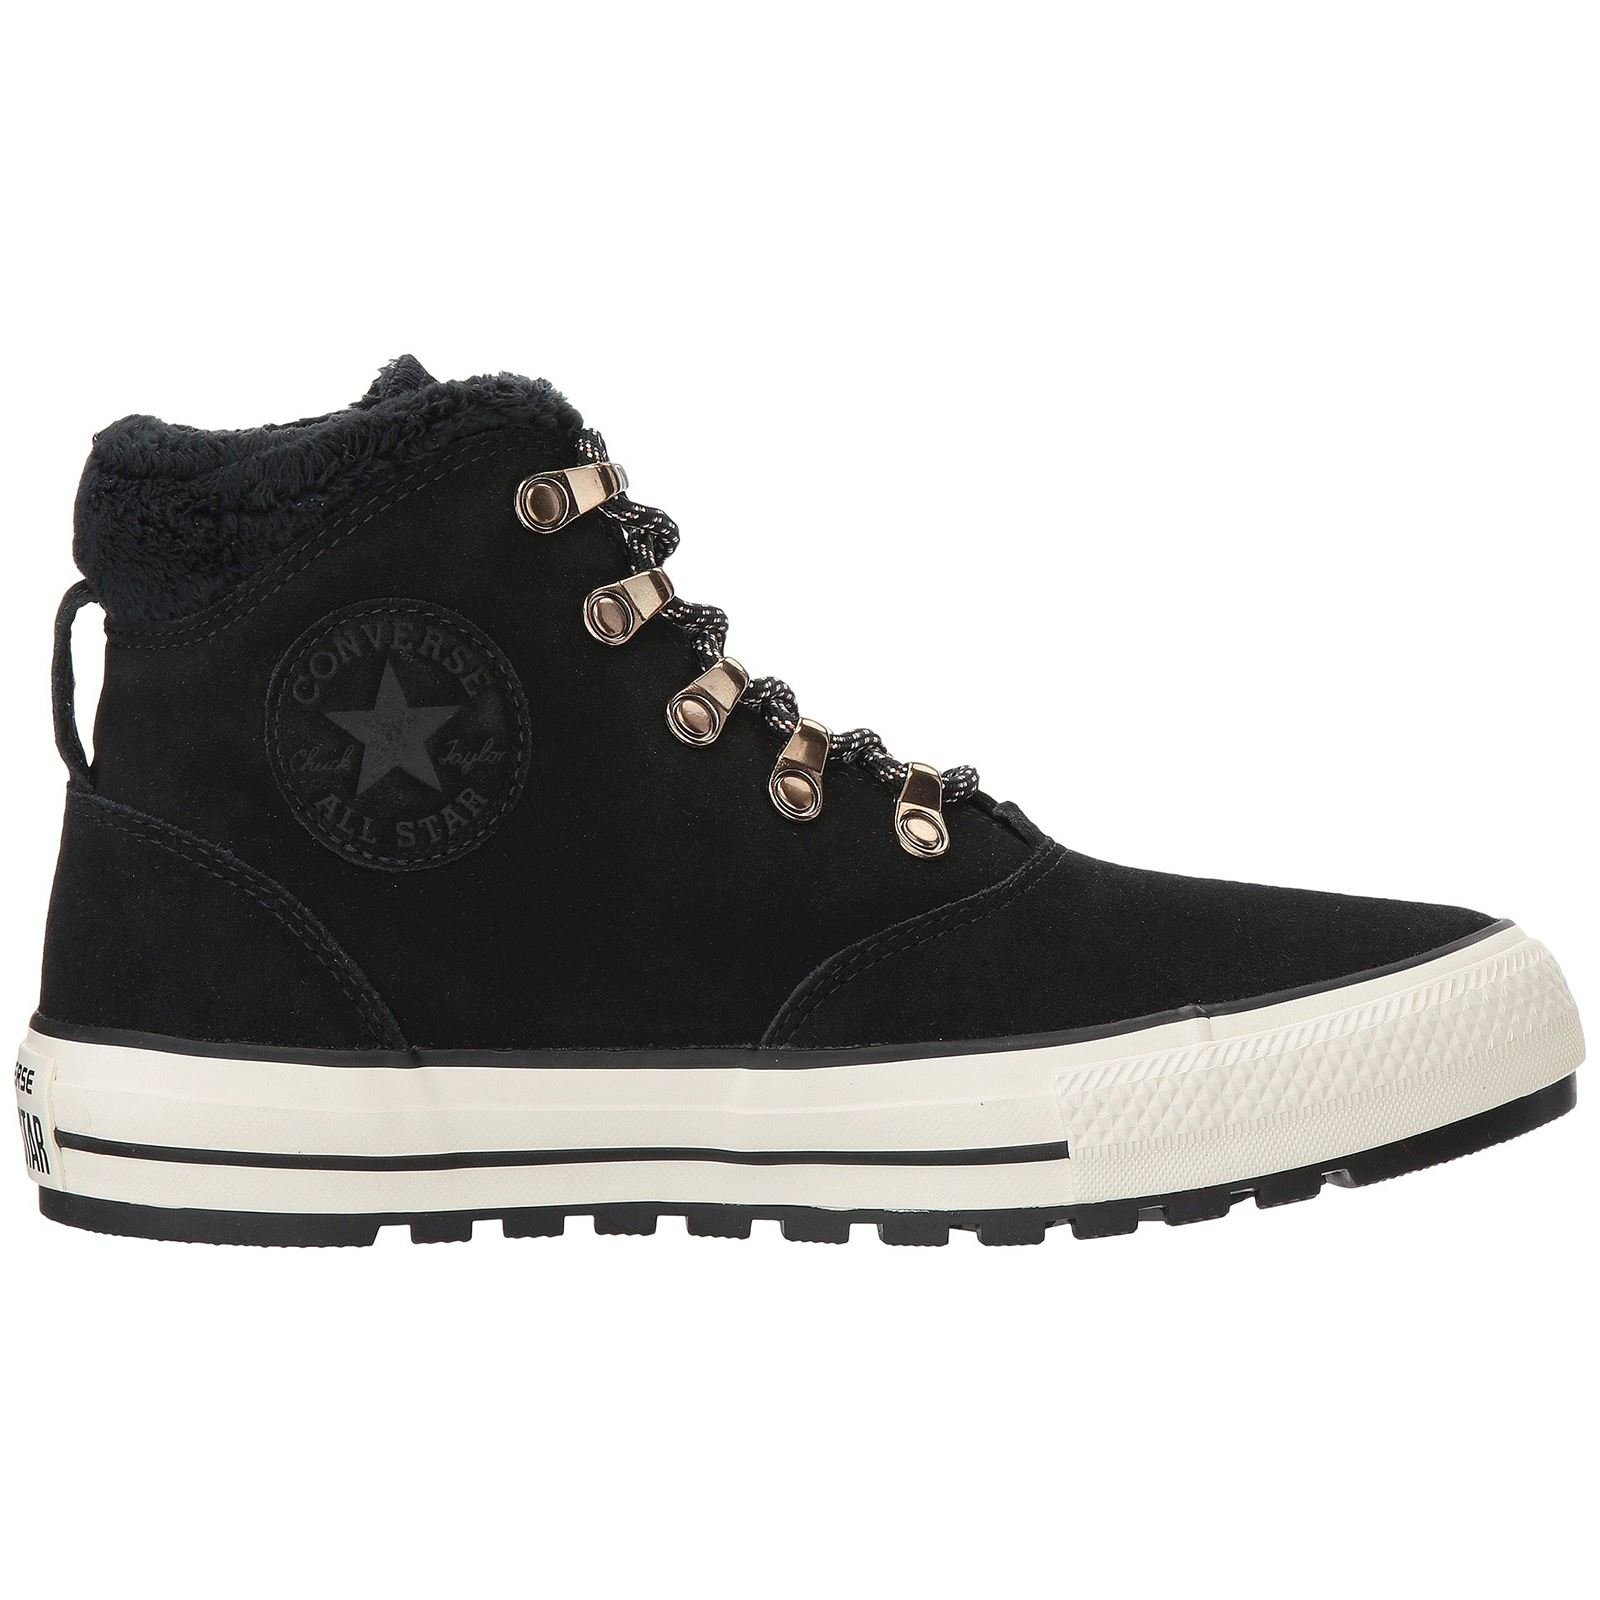 Converse CTAS Ember Boot Hi Mens Skateboarding-Shoes 557935C_7.5 - Black/Black/Egret